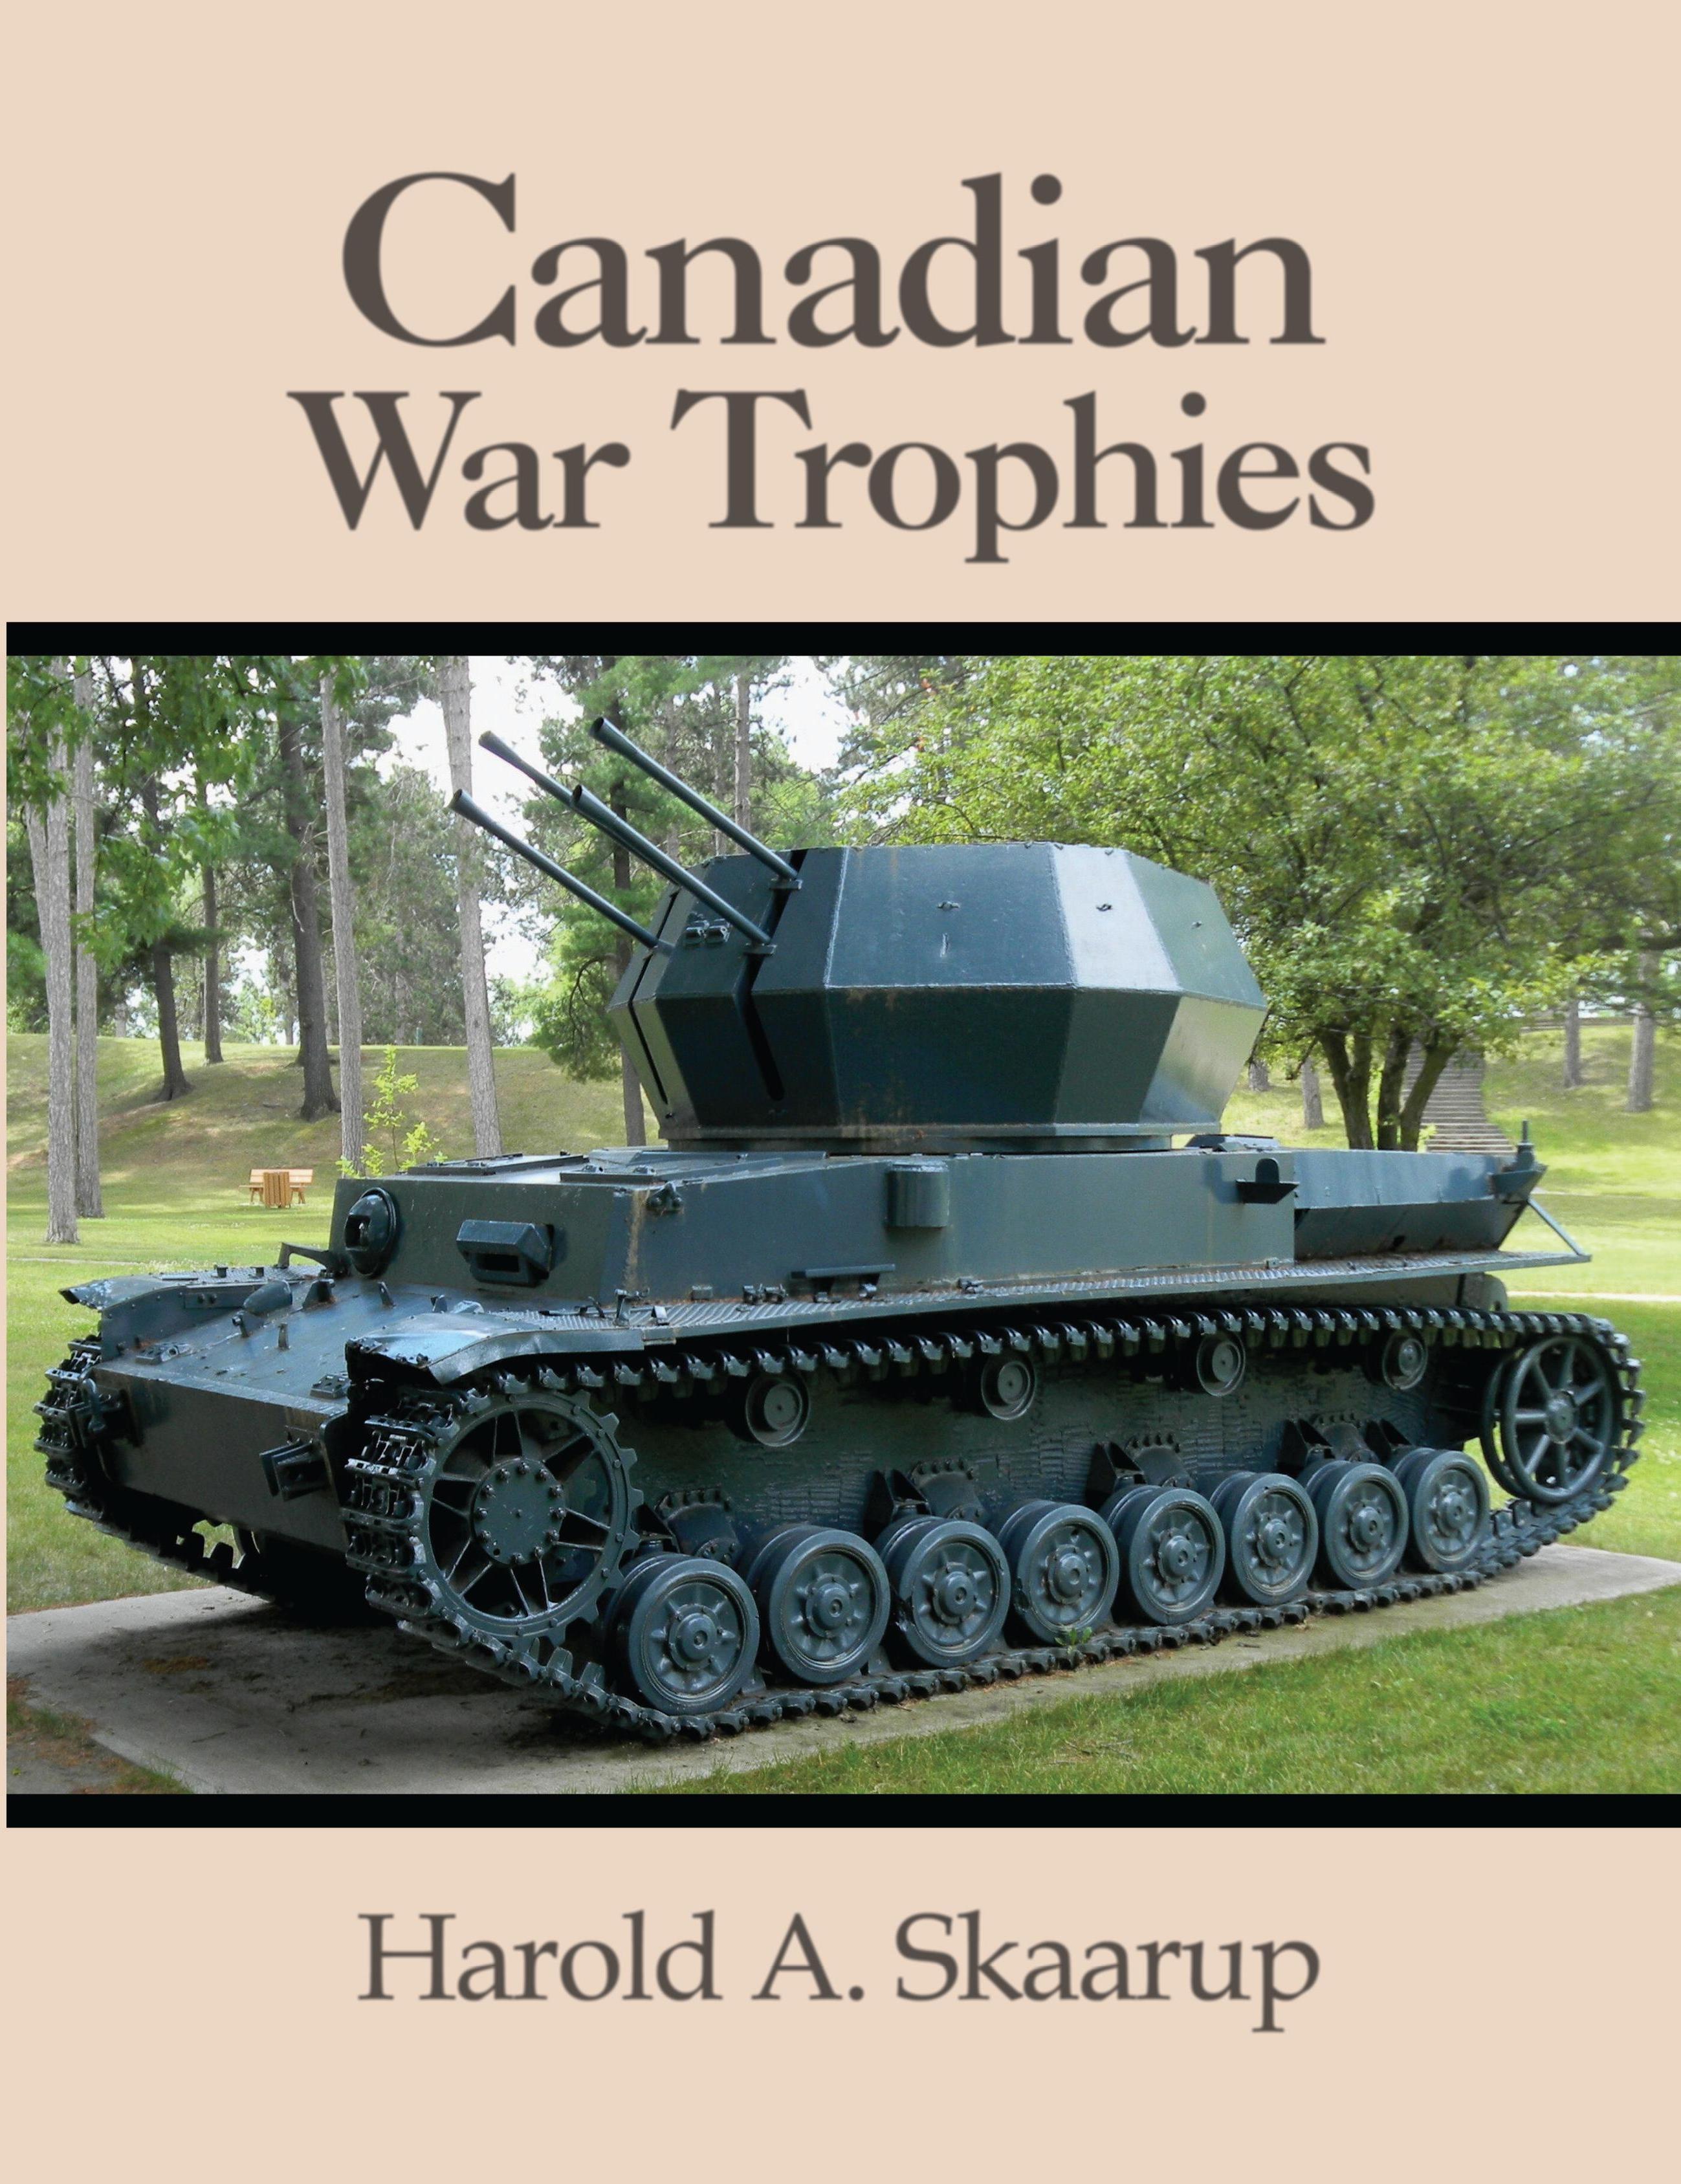 Canadian War Trophies